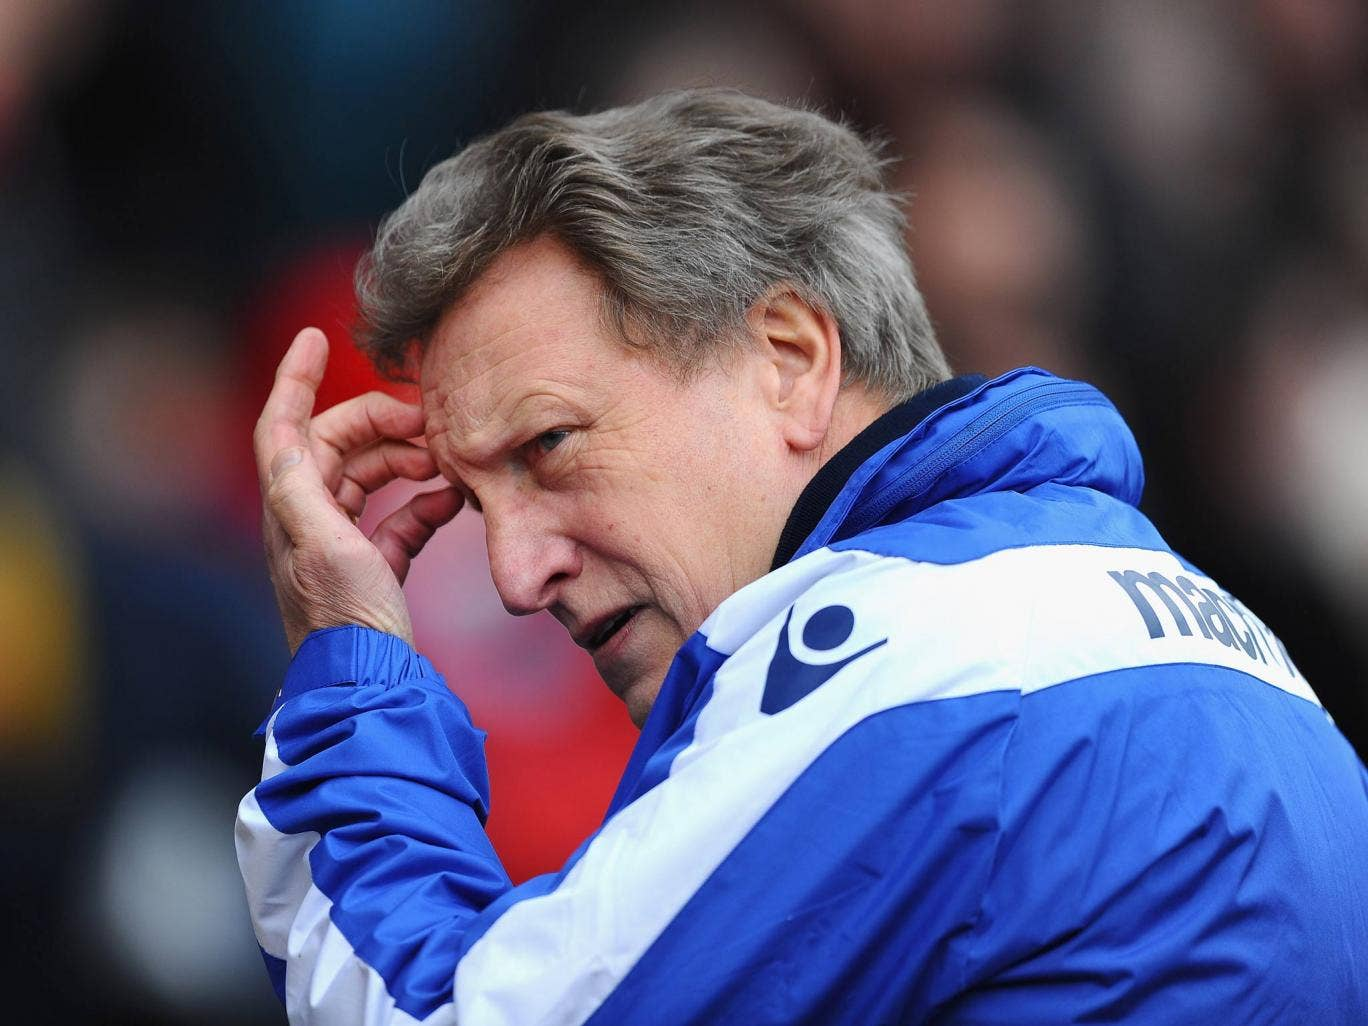 Leed manager Neil Warnock